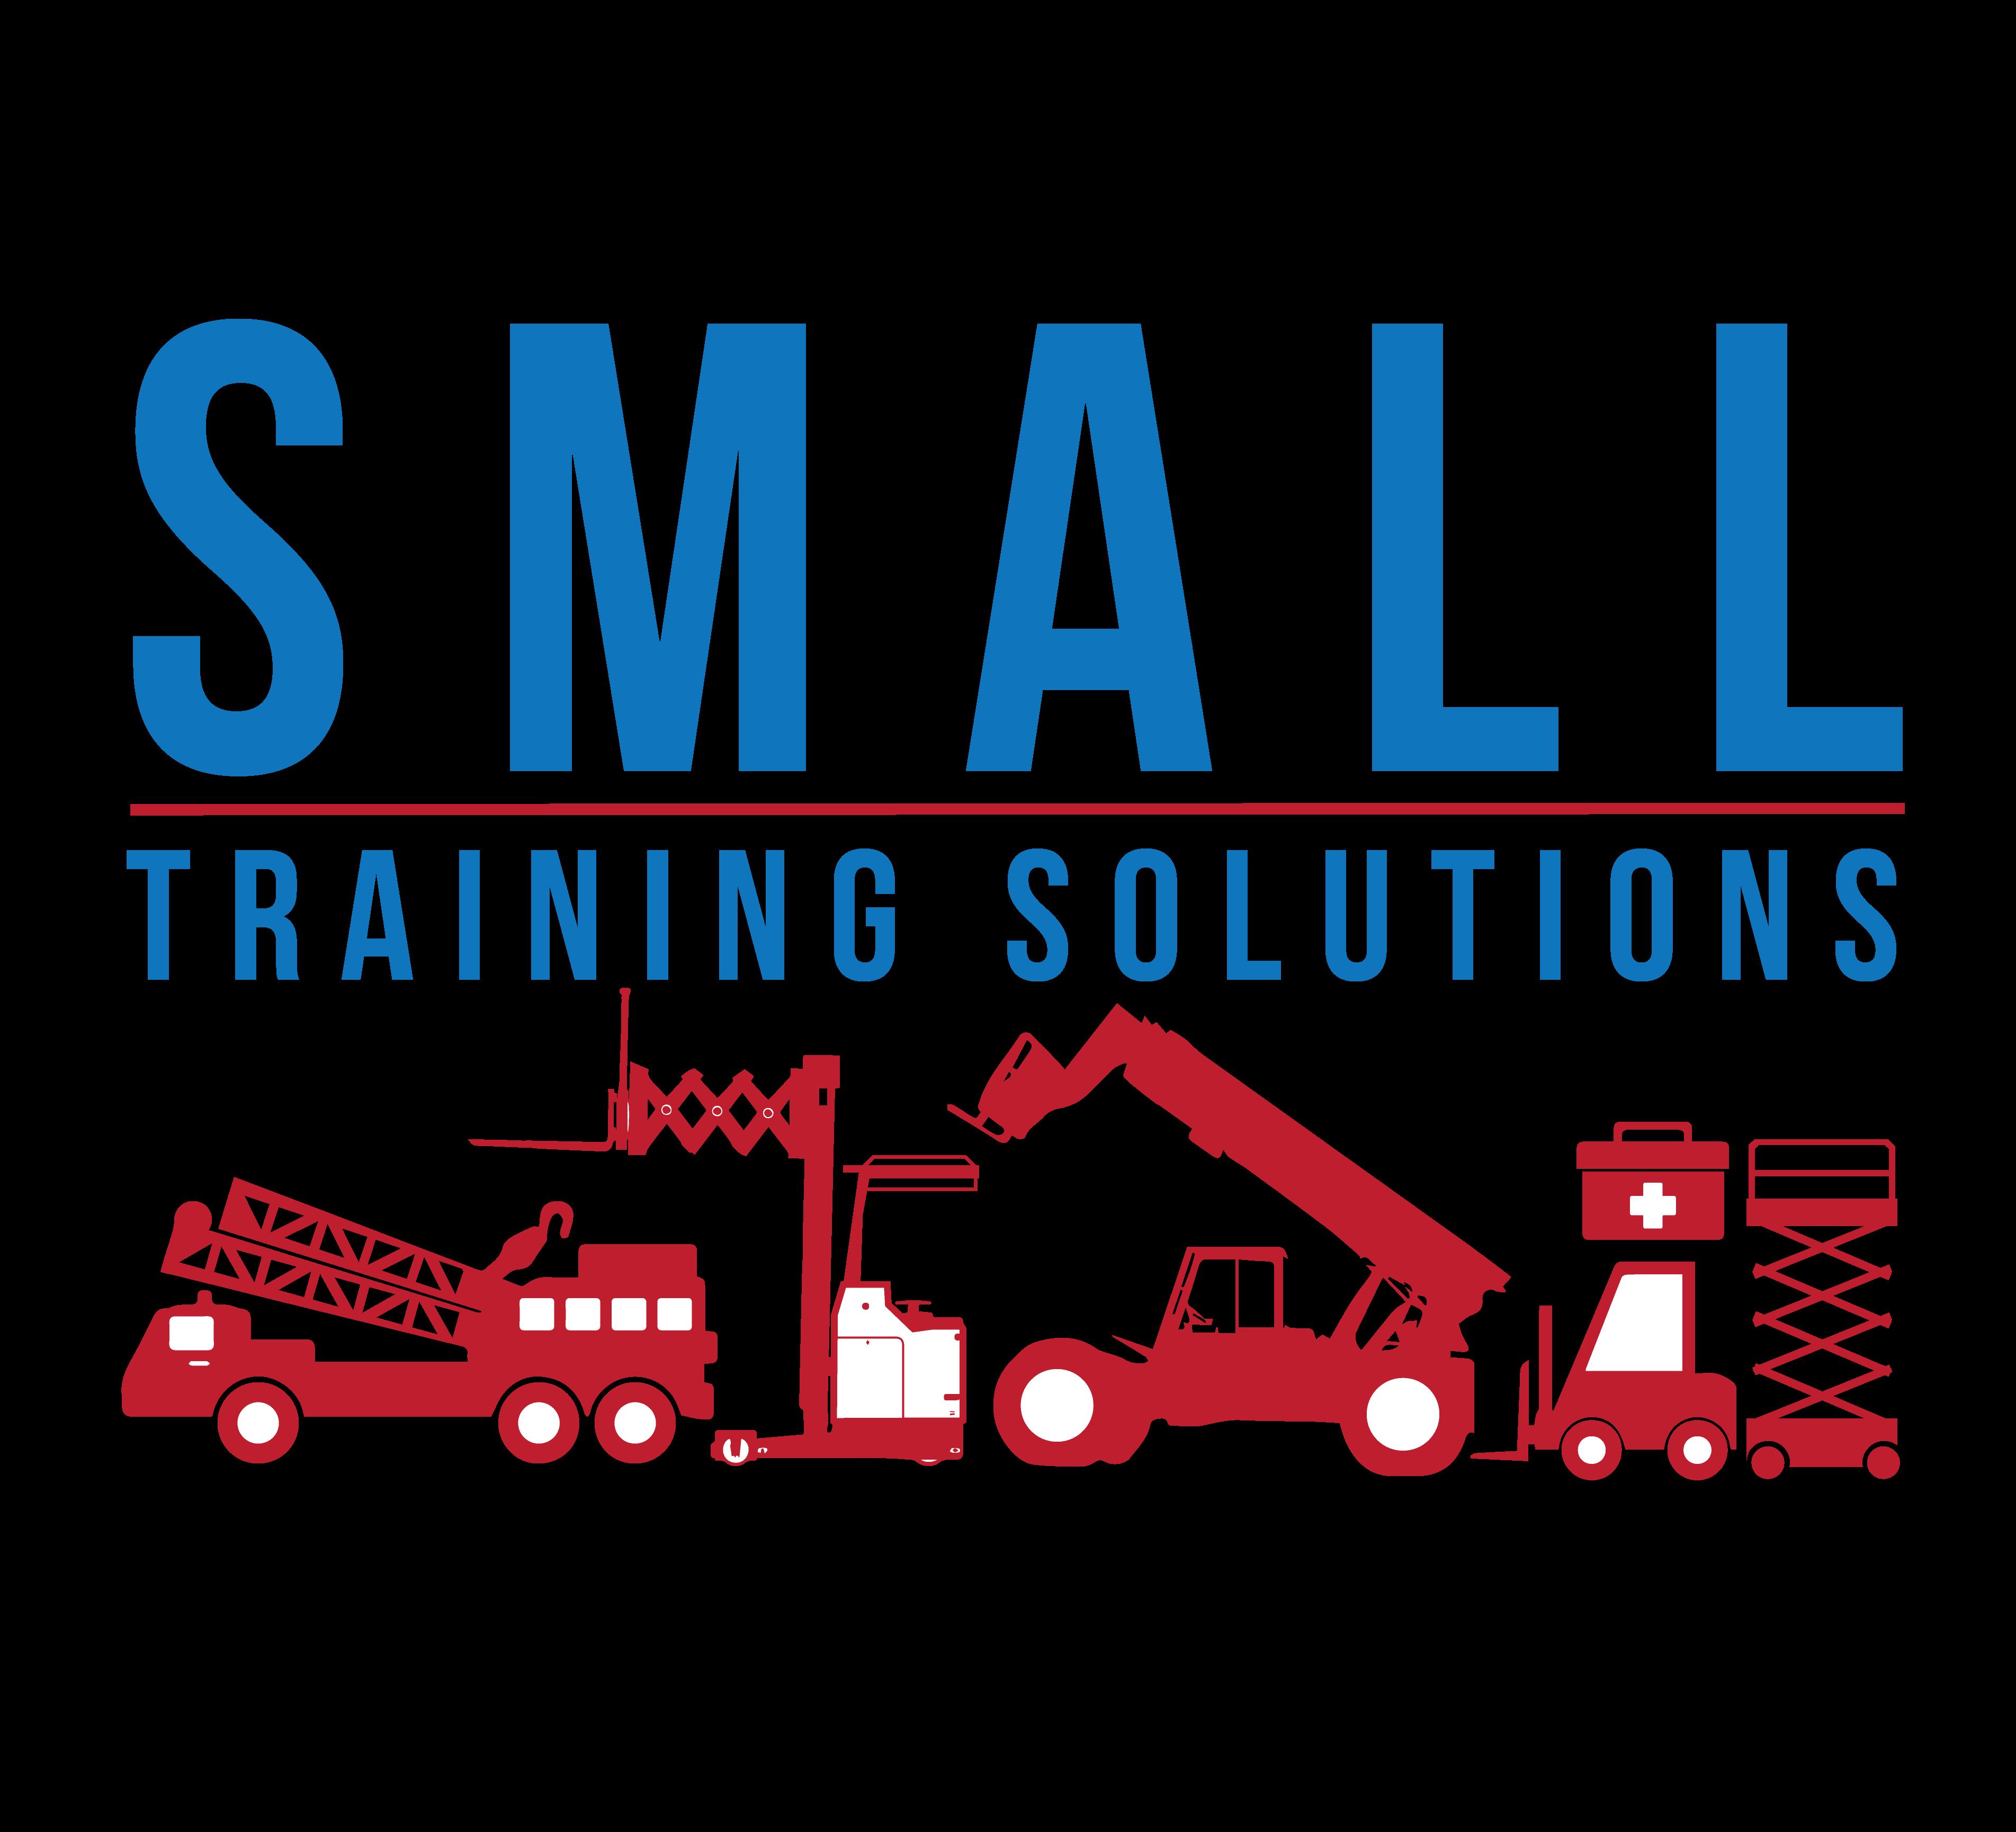 Small Training Solutions logo